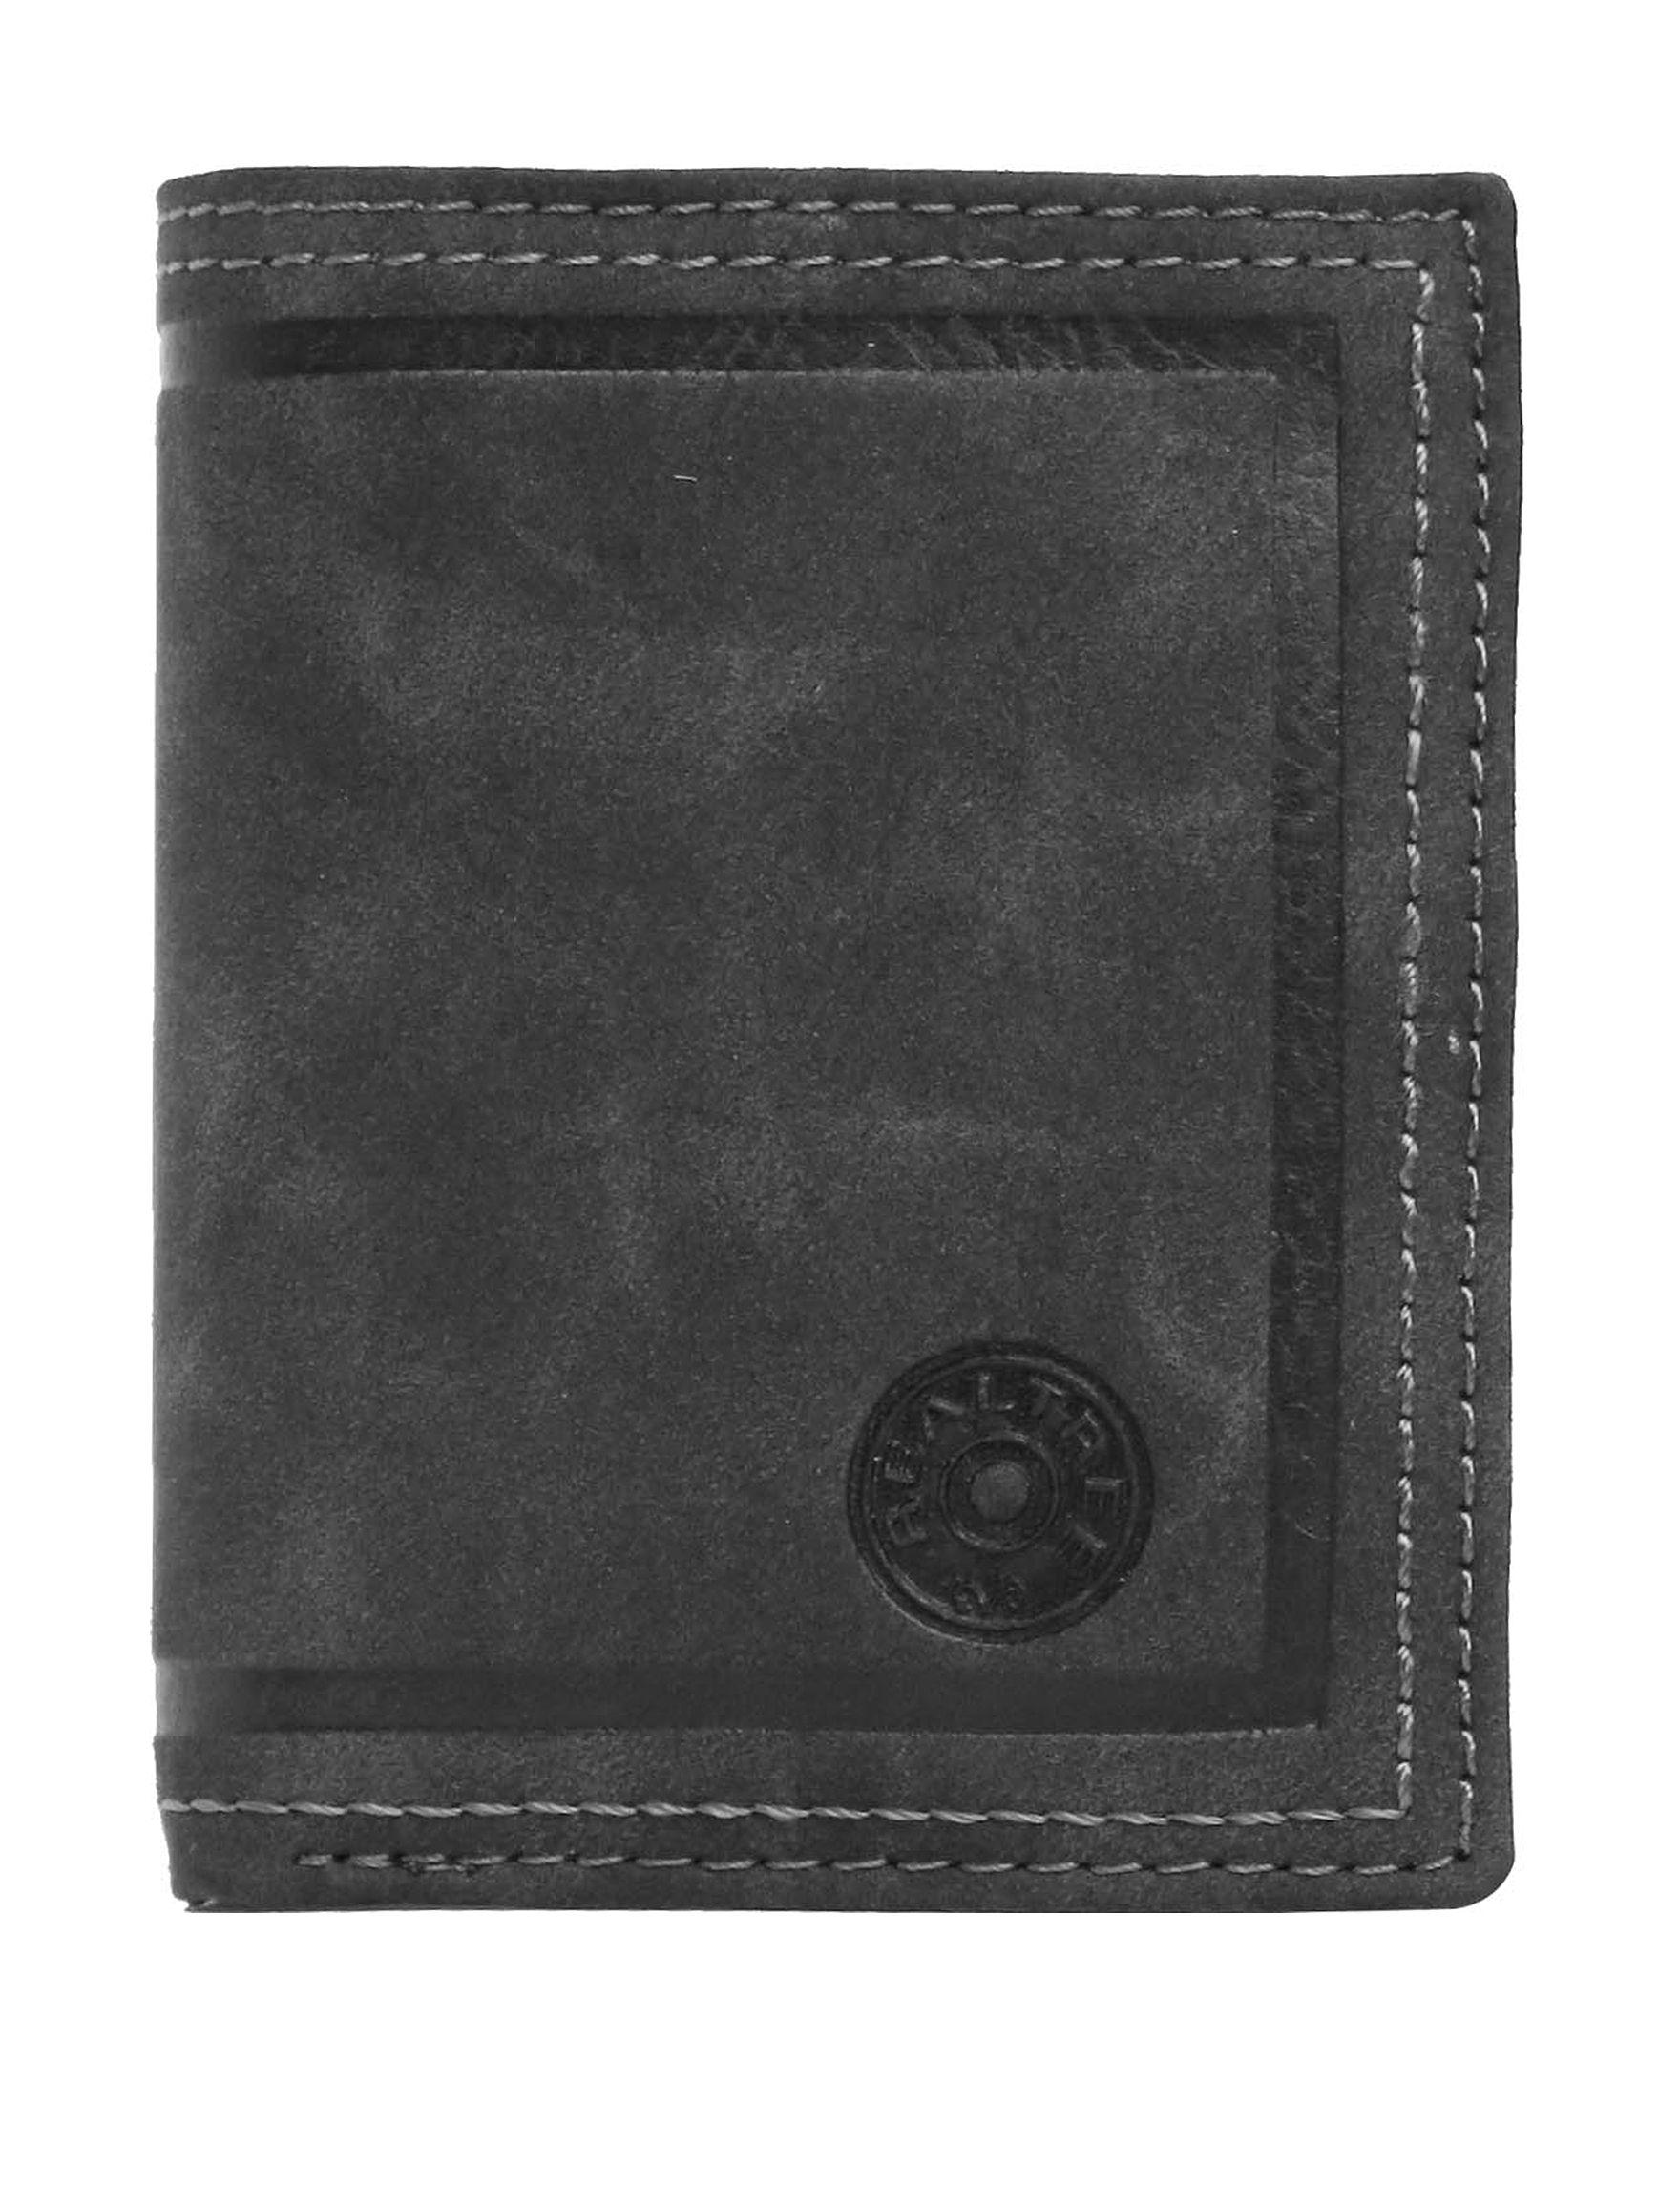 Realtree Black Tri-fold Wallets